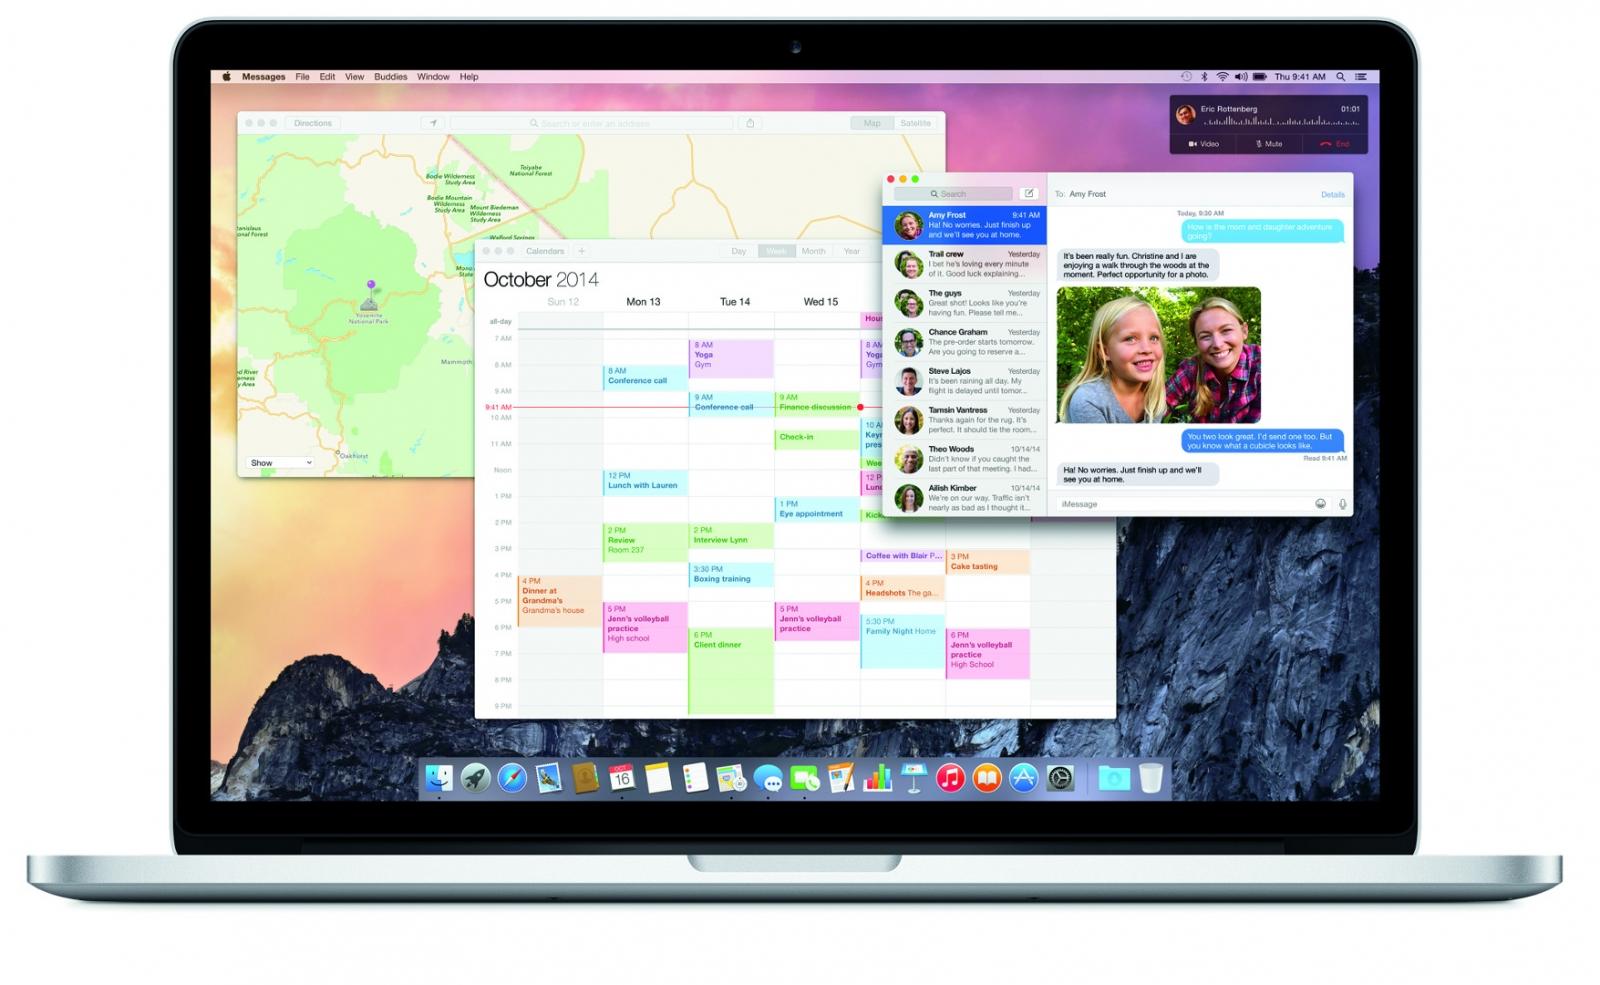 Apple MacBook Pro Yosemite OS X 10.10